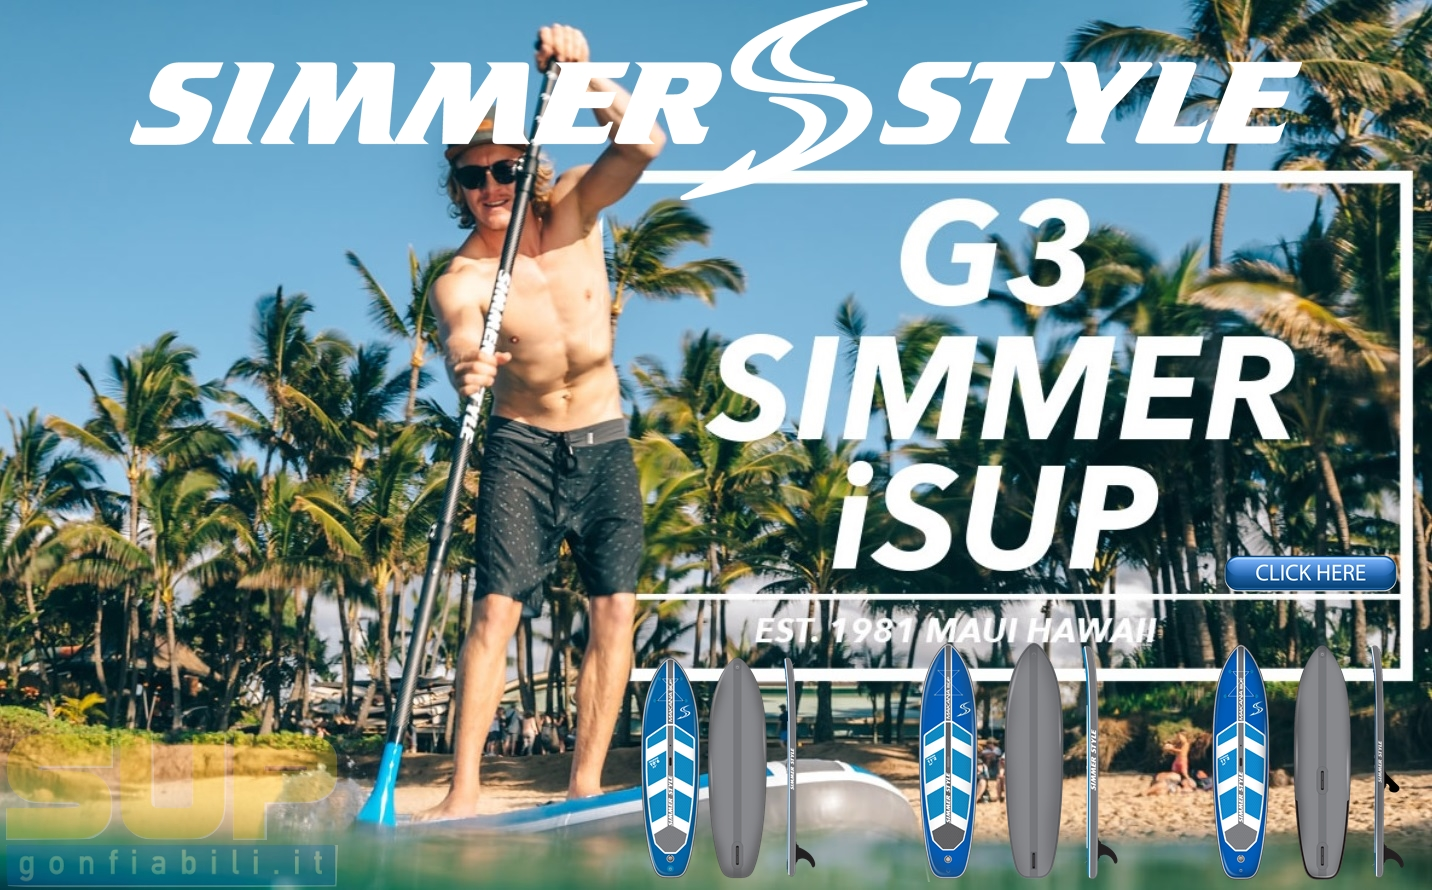 simmer-style-isup-banner